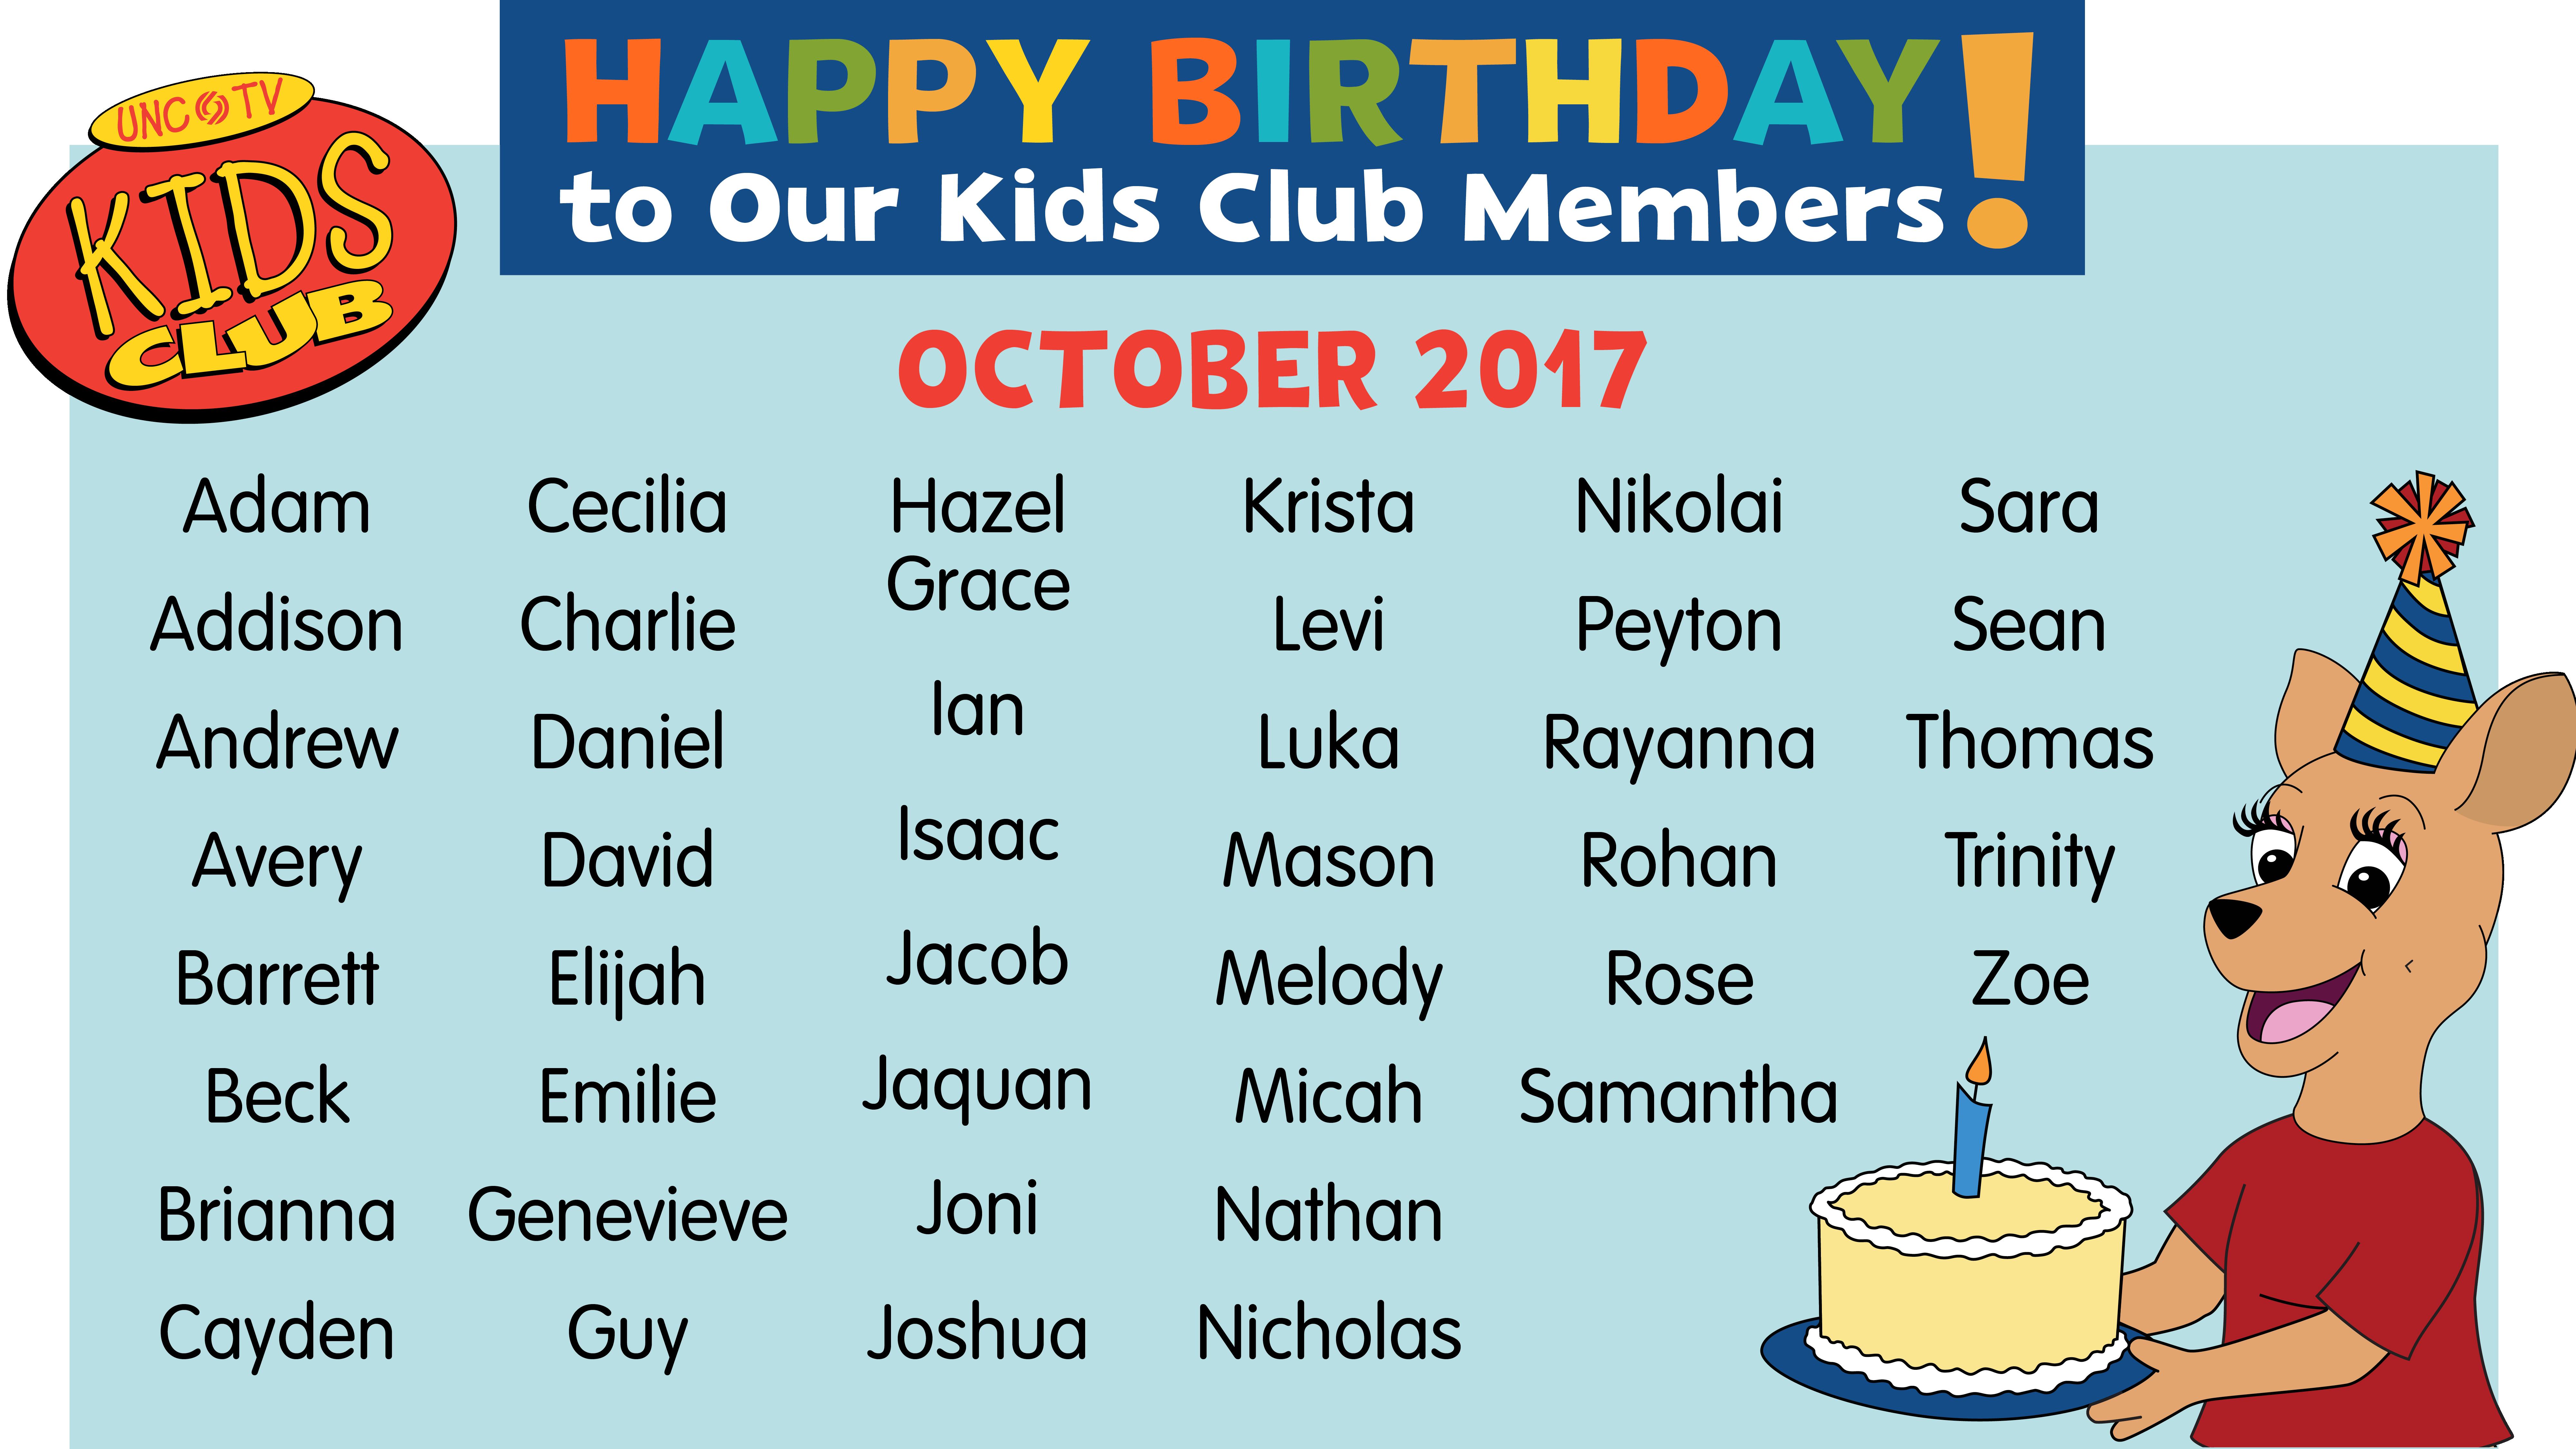 Kids Club June Birthdays